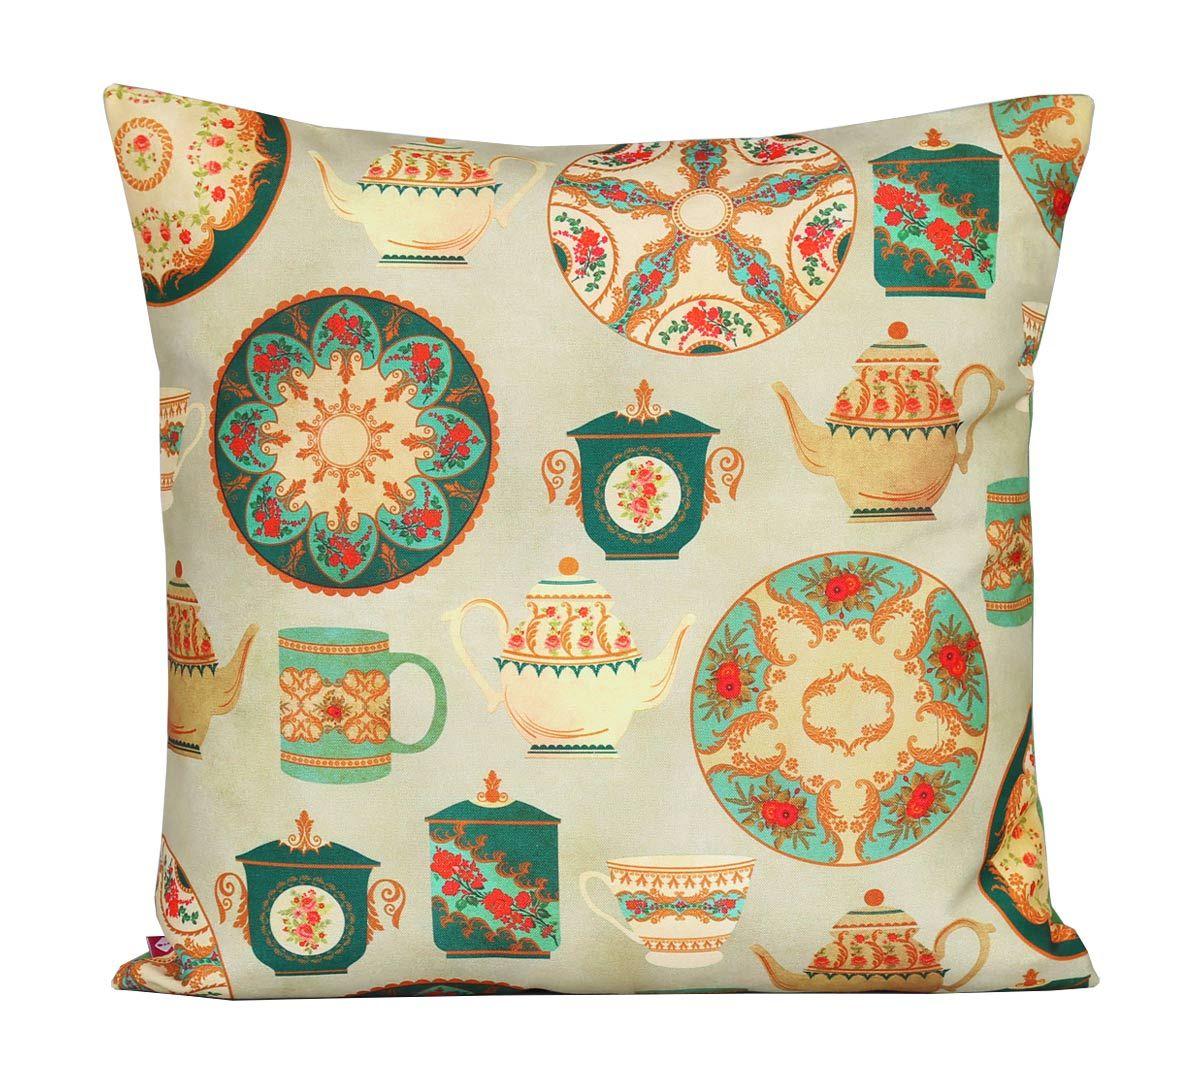 India Circus All About Tea Canvas Cushion Cover